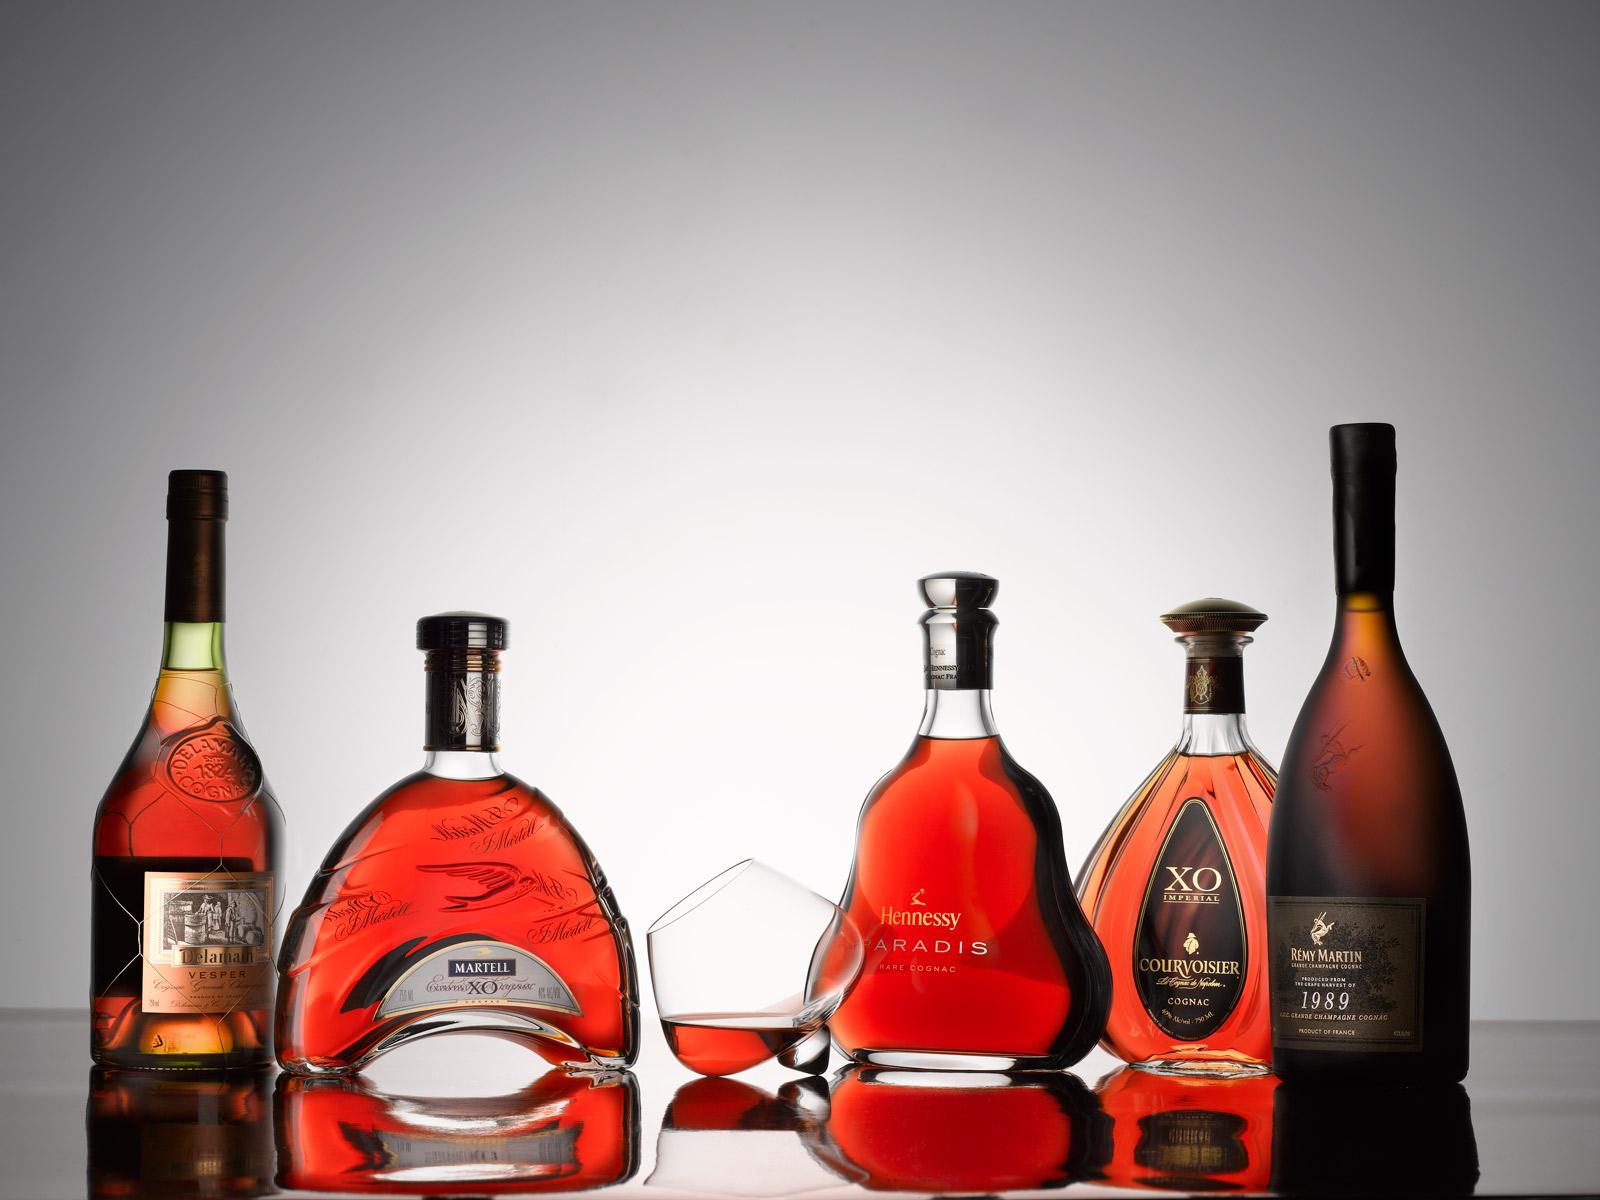 hennessy-vsop-cognac